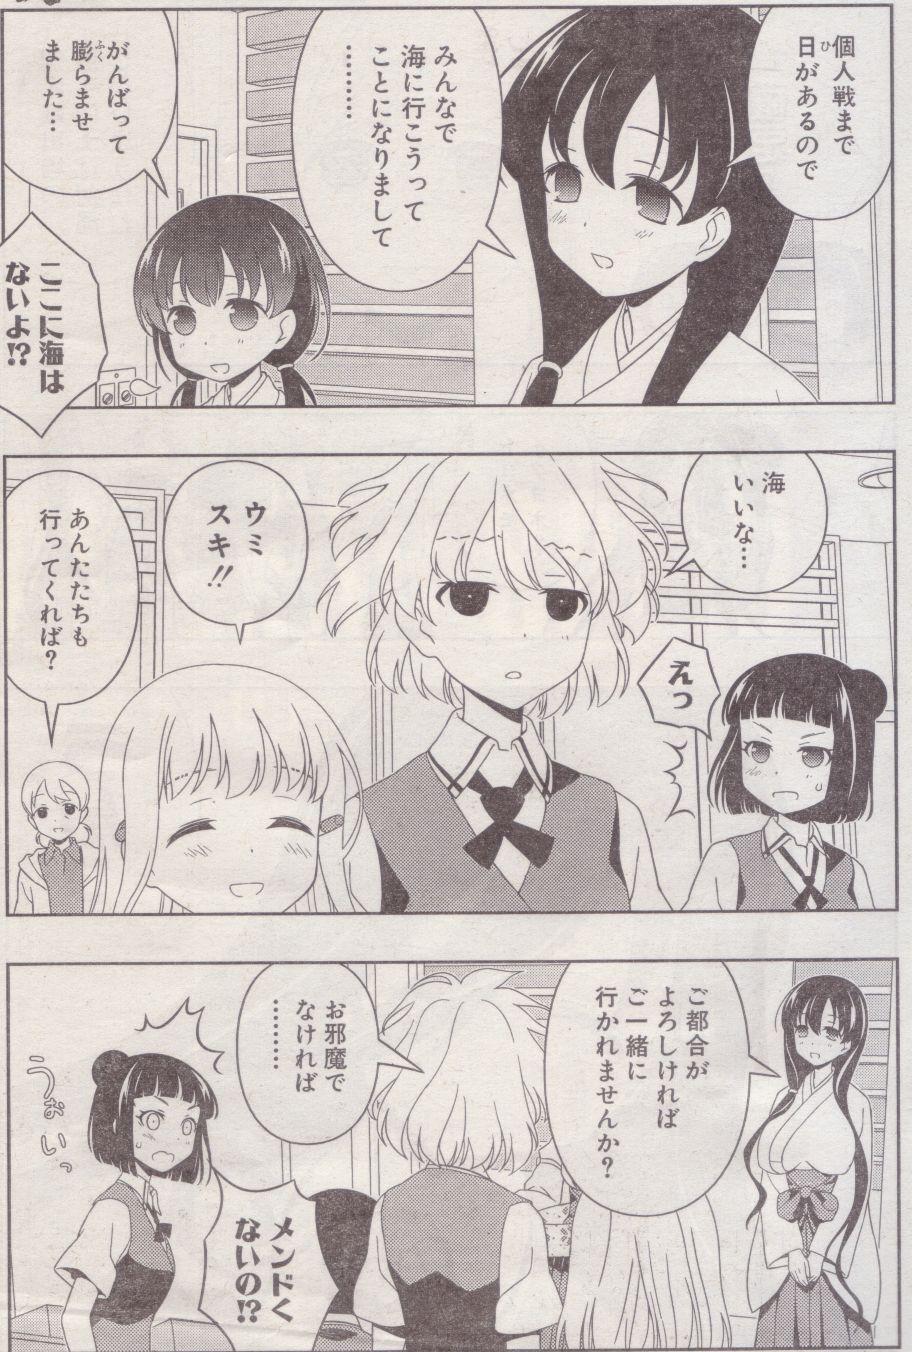 http://blog-imgs-45.fc2.com/a/n/k/ankosokuho/su639582.jpg